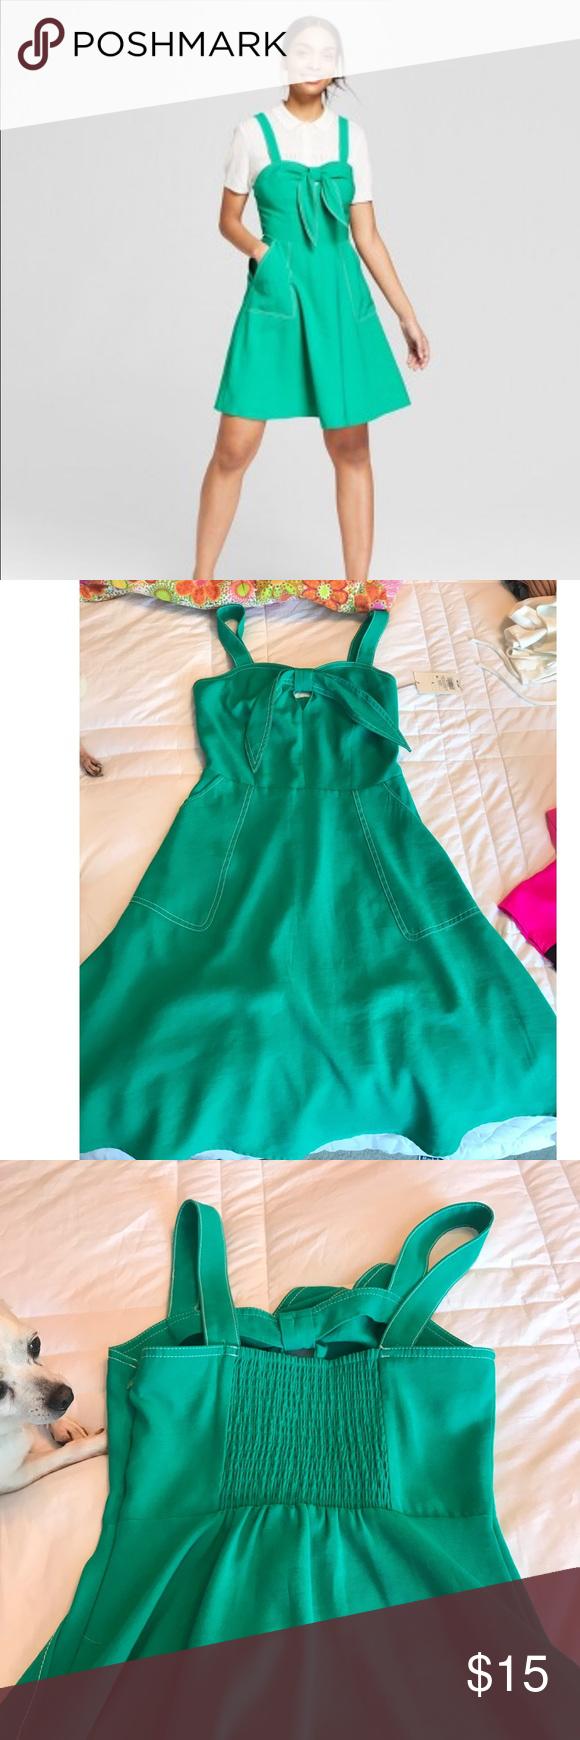 Target A New Day Green Dress Green Dress Dresses Tie Front Dress [ 1740 x 580 Pixel ]